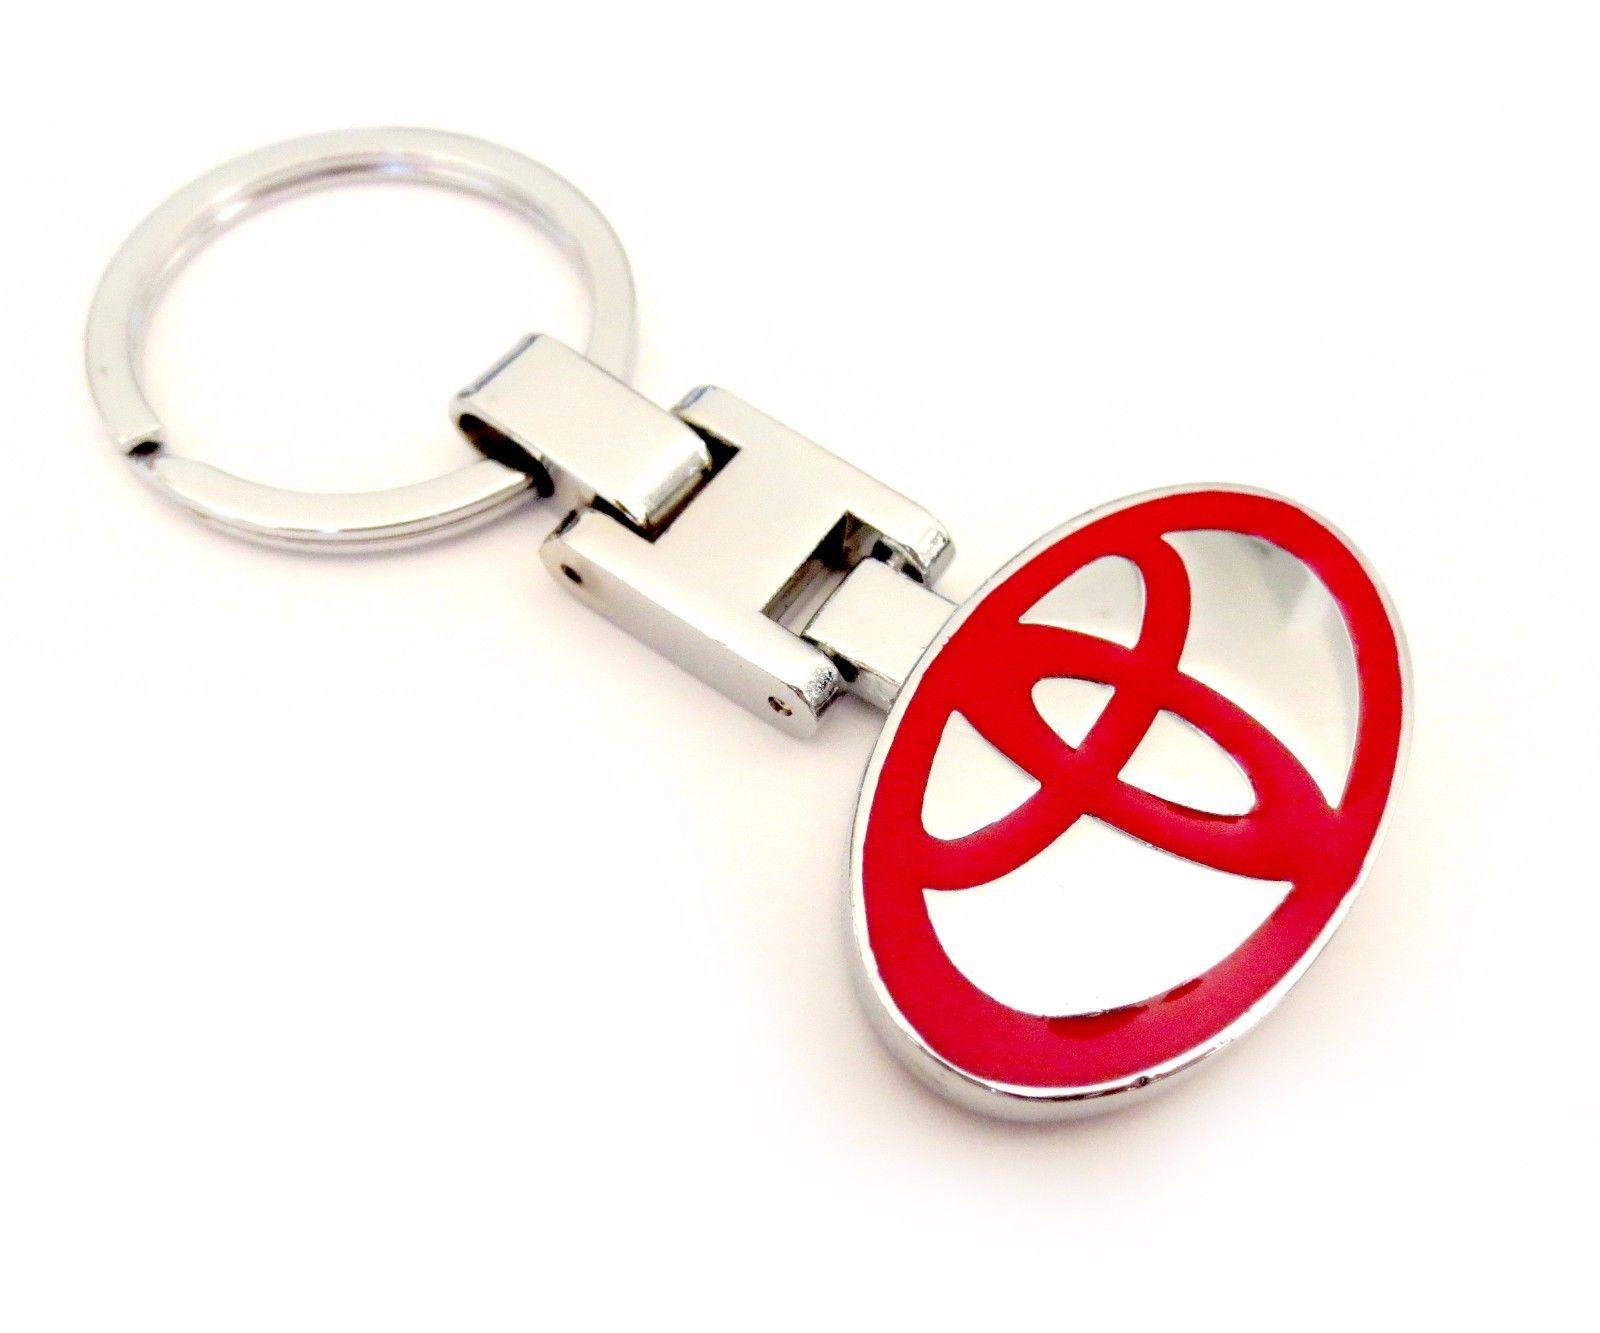 ATS-0554_Stainless_Key_Ring_Toyota_Logo_Key_Chain_Metal_key_Holder_Silver_Red.jpg